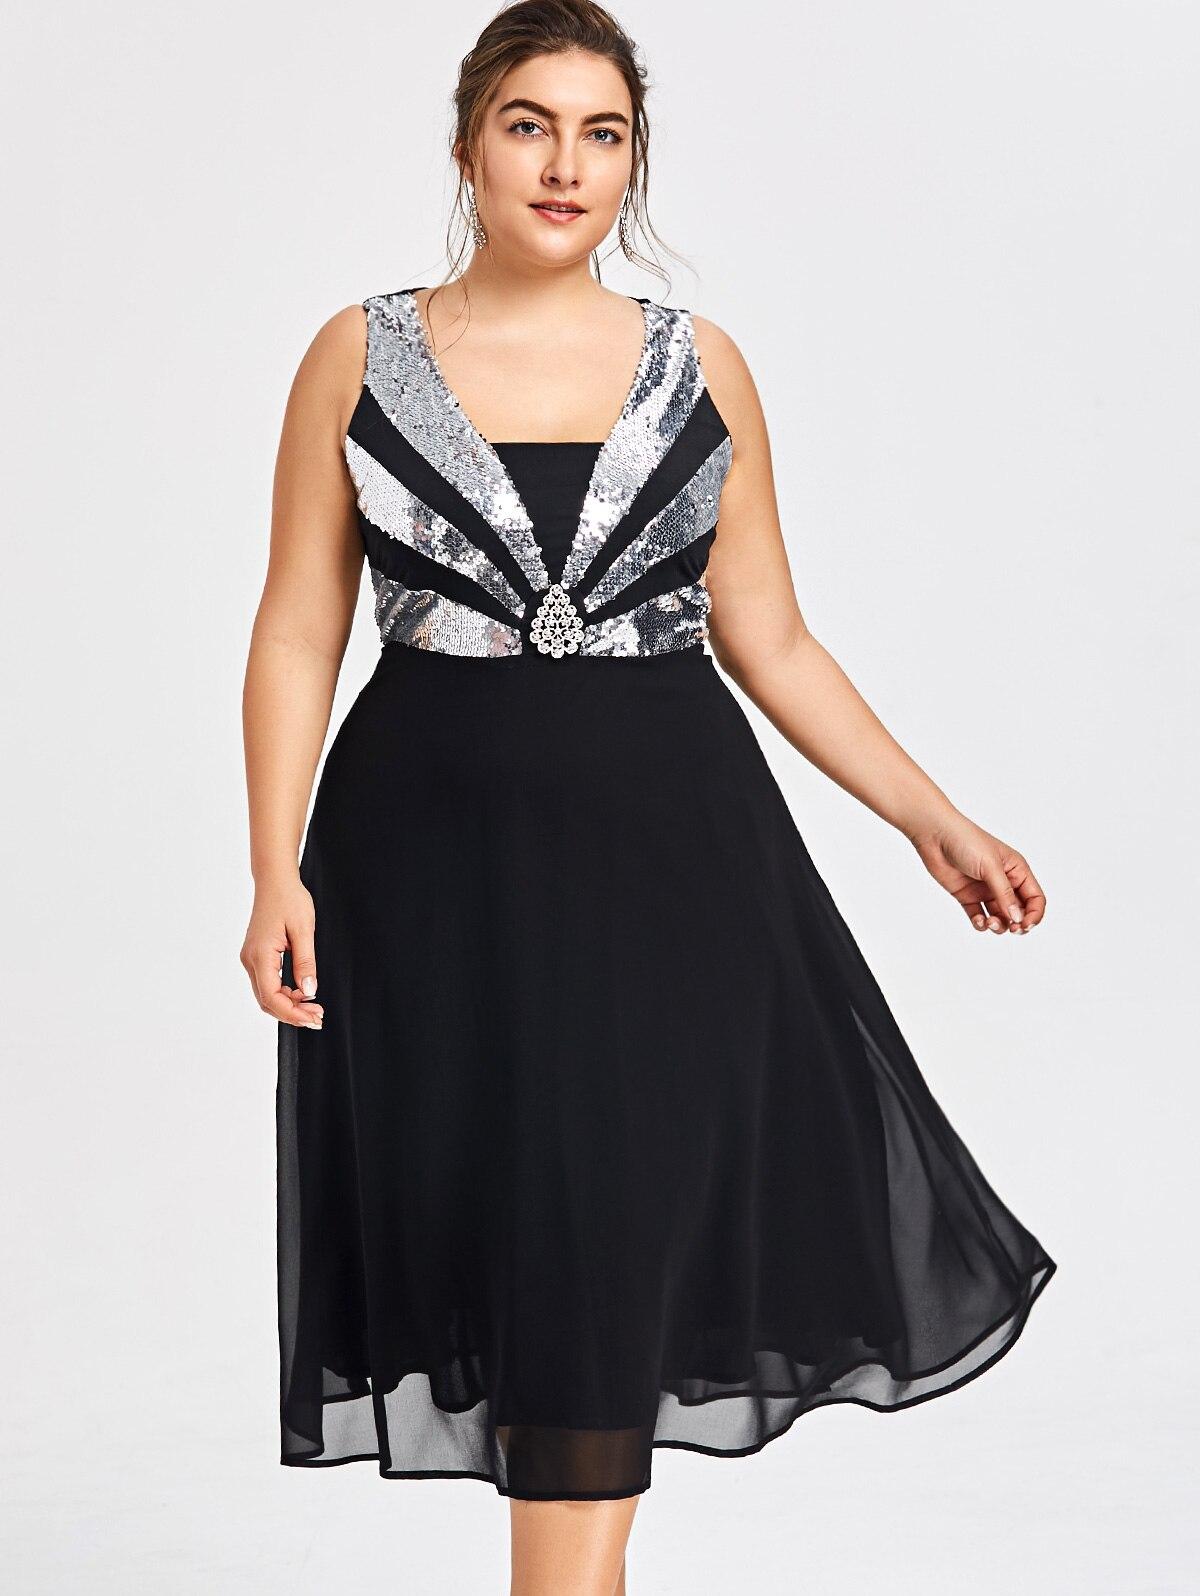 AZULINA Plus Size Glittery Flowy Party Dress Women Sequined Sleeveless Party  Dress Robe Elegant Chiffon Dresses Vestido Big Size-in Dresses from Women s  ... 722c2408d84c